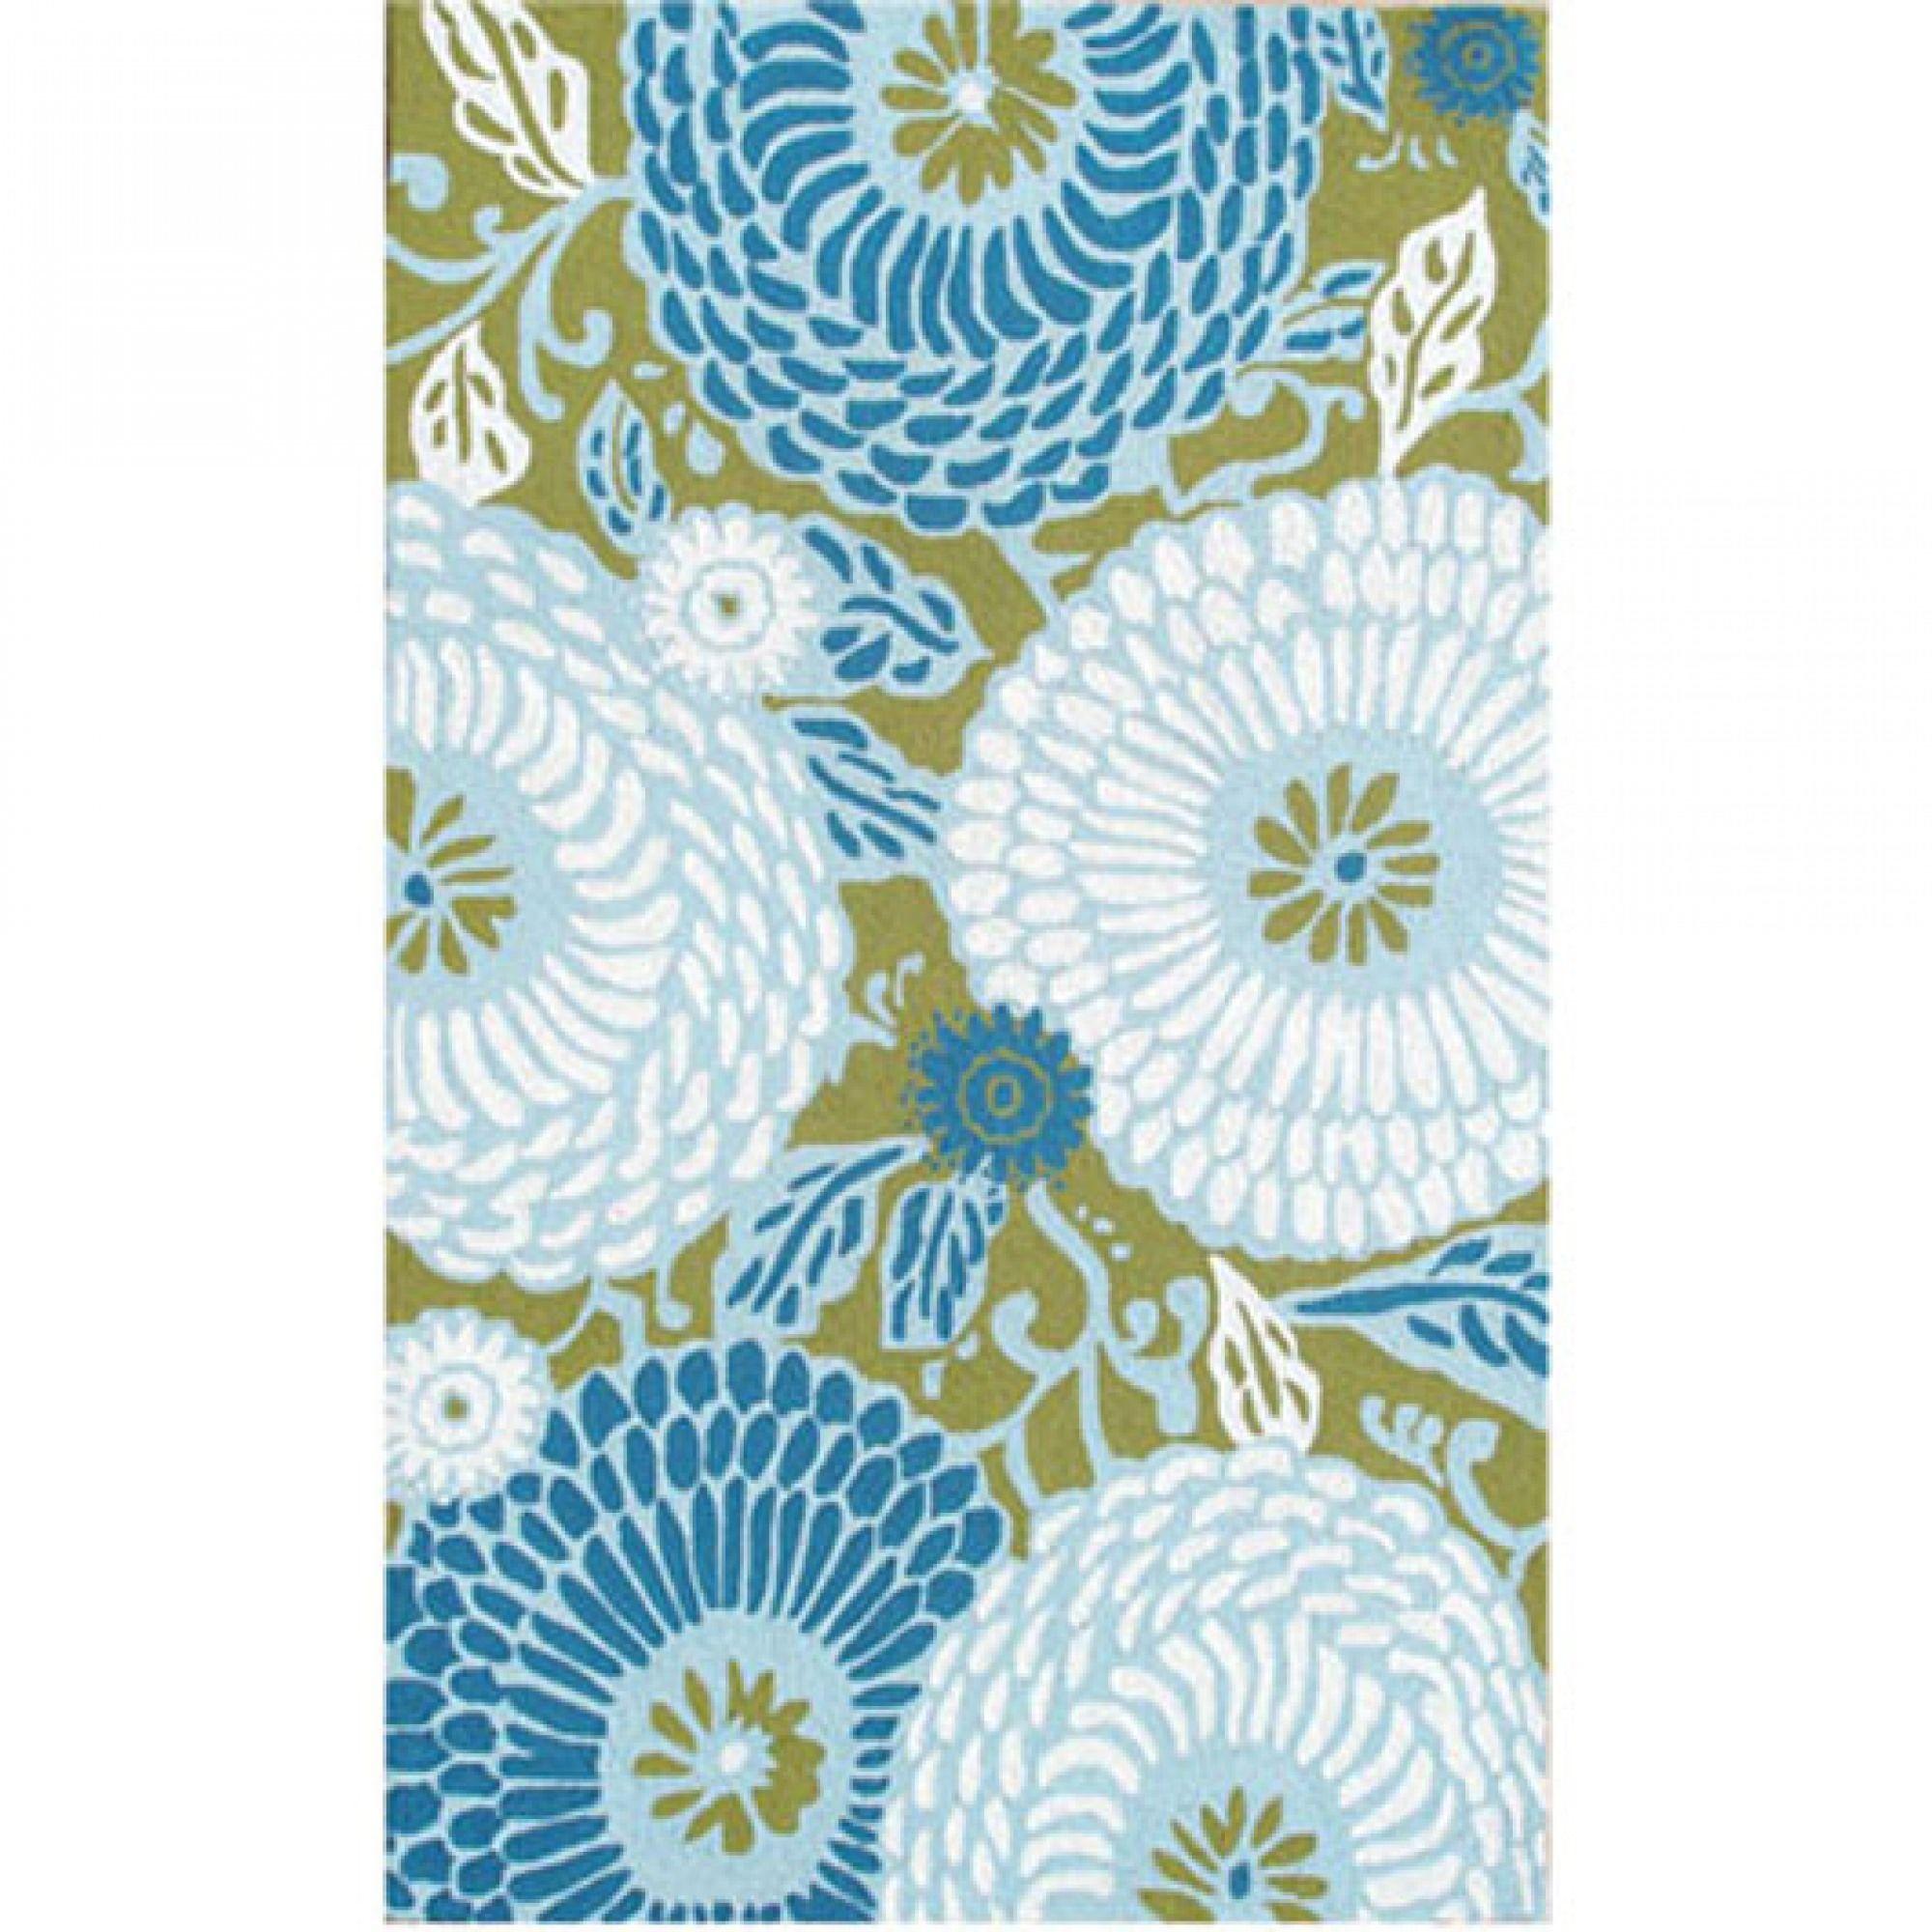 Dandelion Green Blue White 8x10 Sku Rugm 25260e